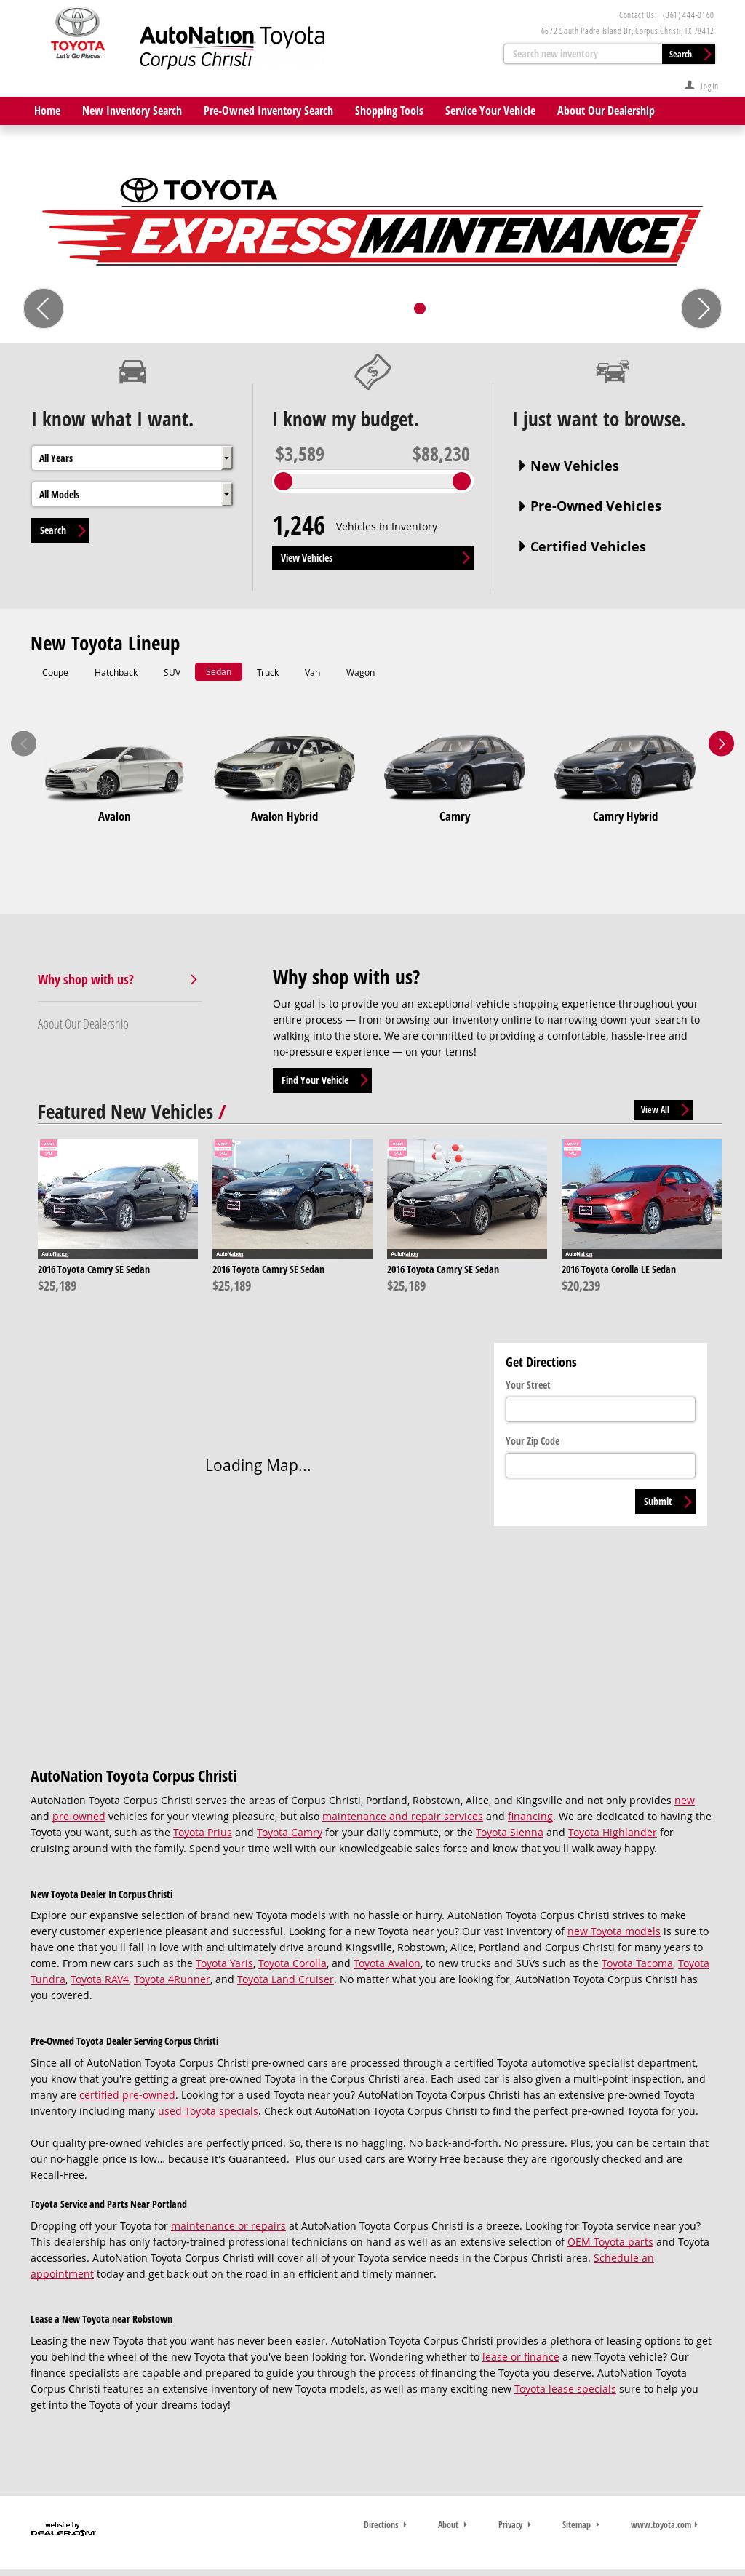 Autonation Toyota Scion Corpus Christi Website History